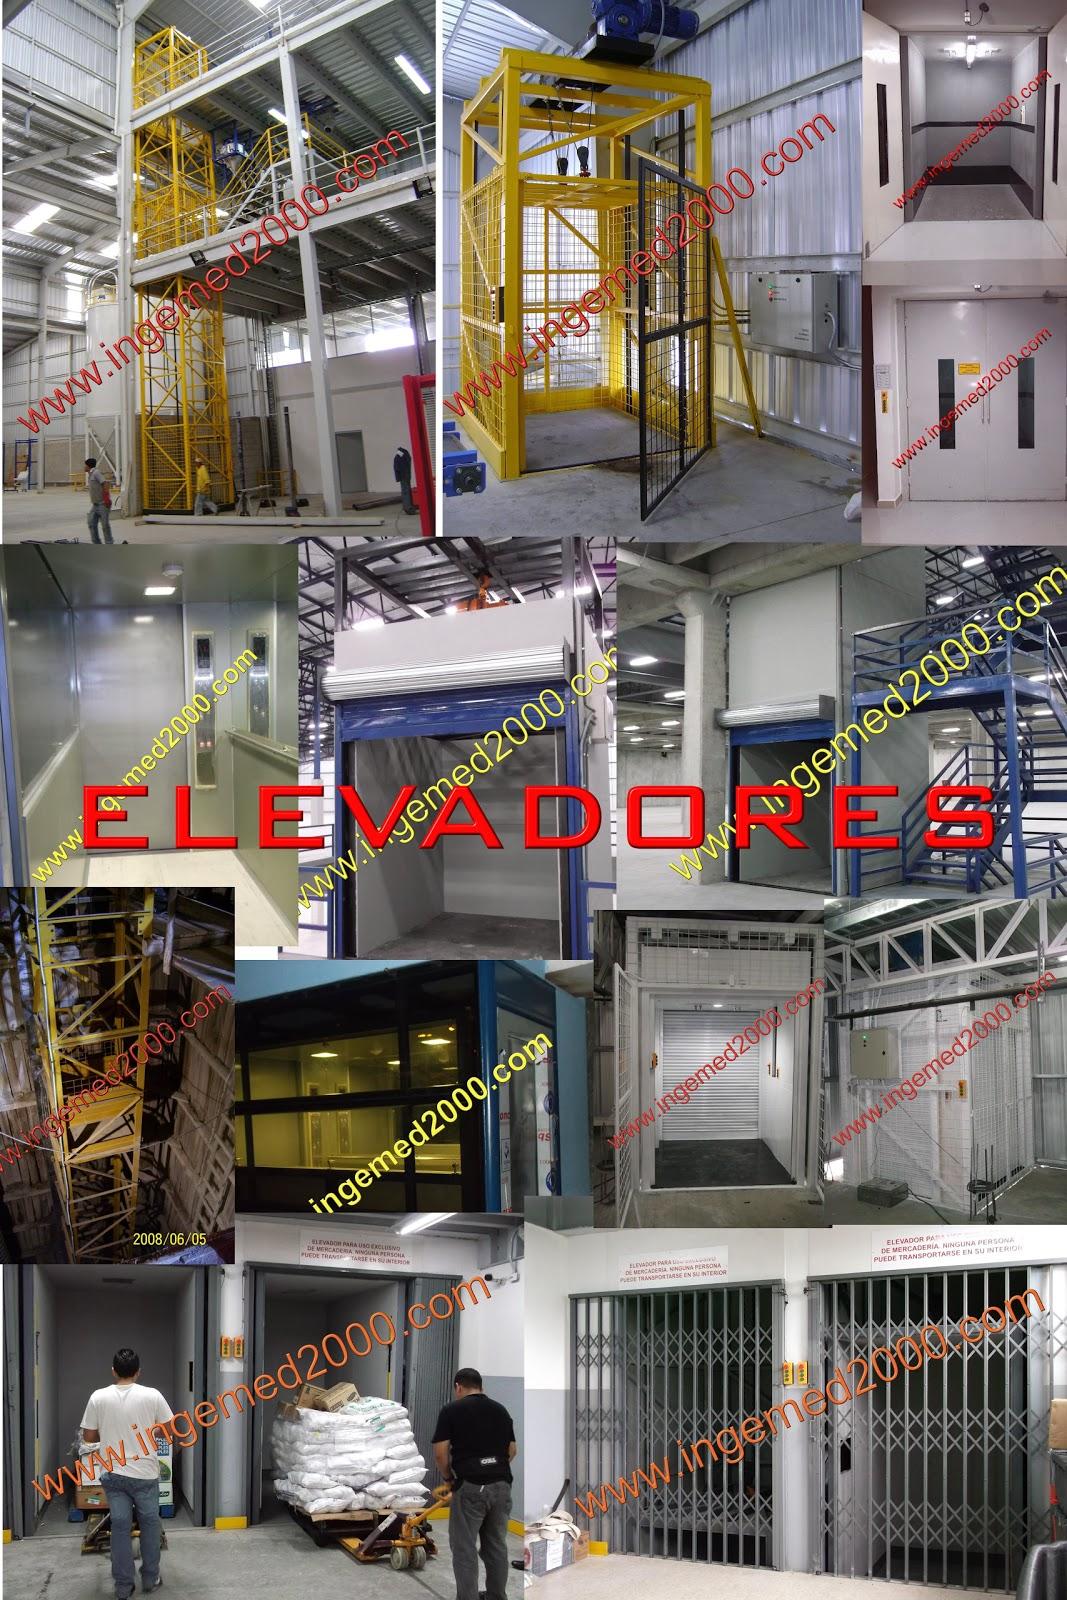 ingemedproductos.blogspot.com